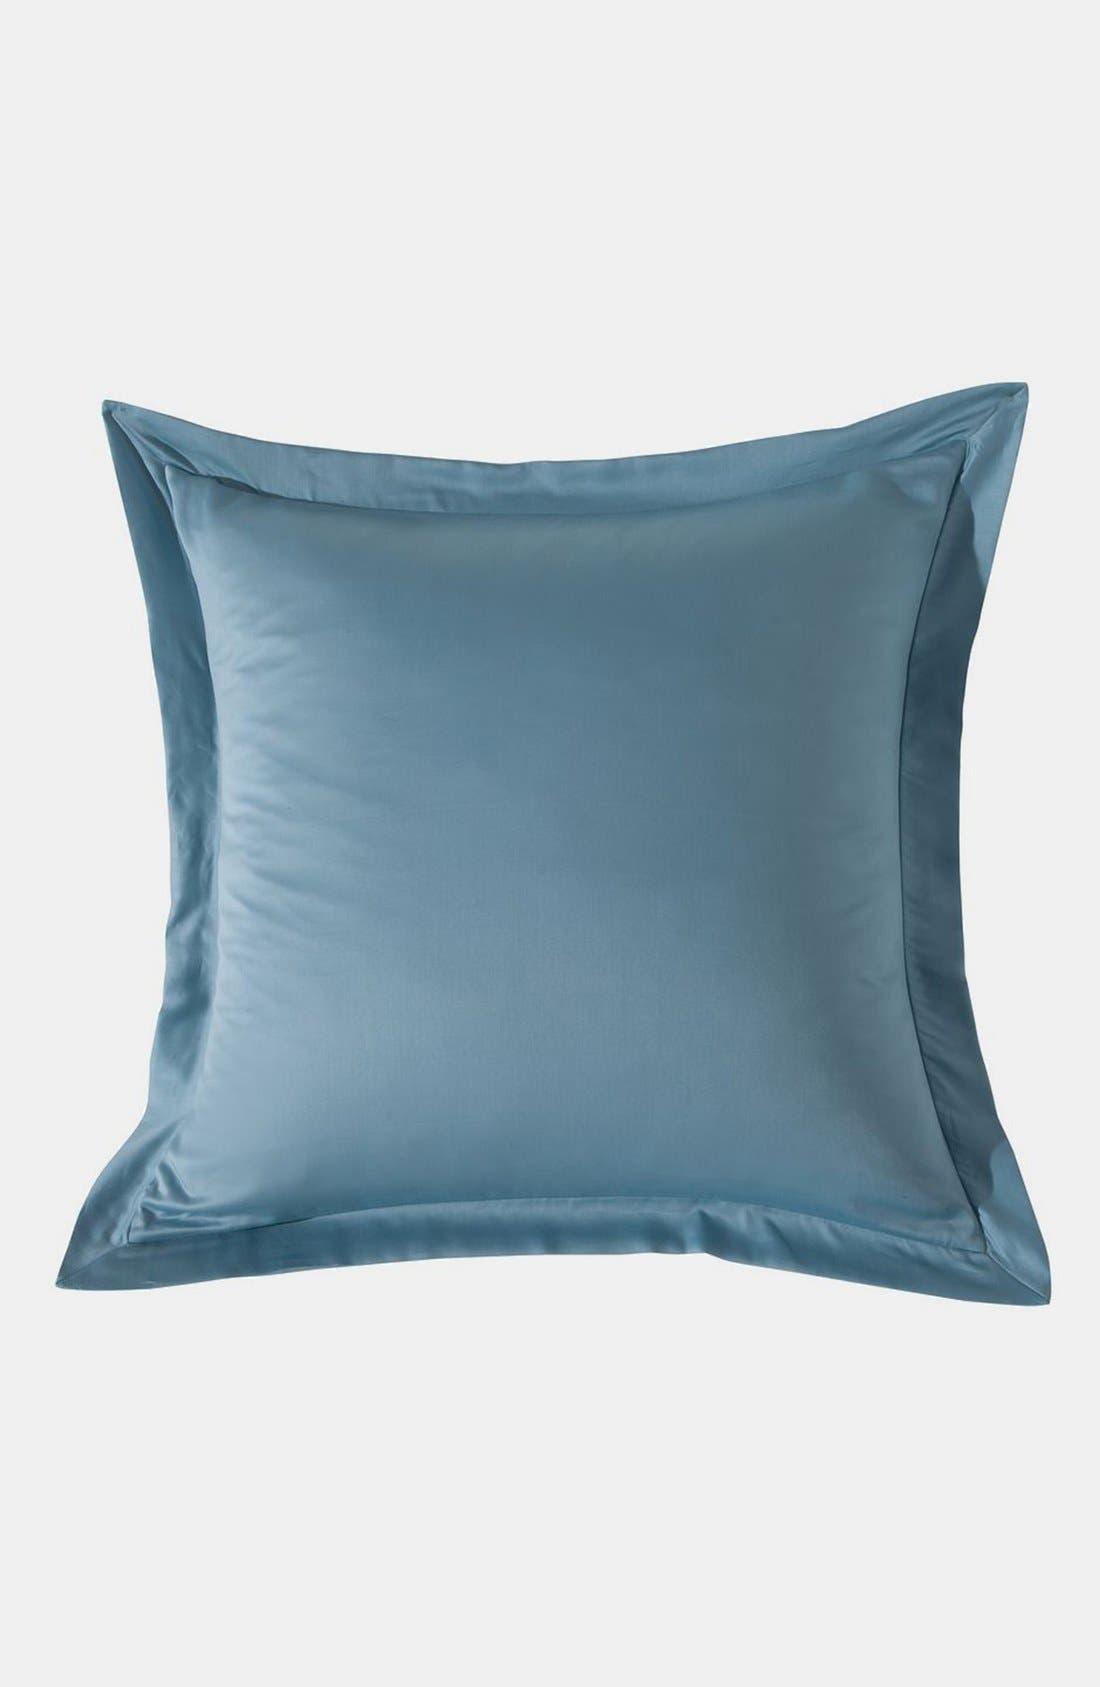 Alternate Image 1 Selected - kensie 'Blue Poppy' Euro Sham (Online Only)